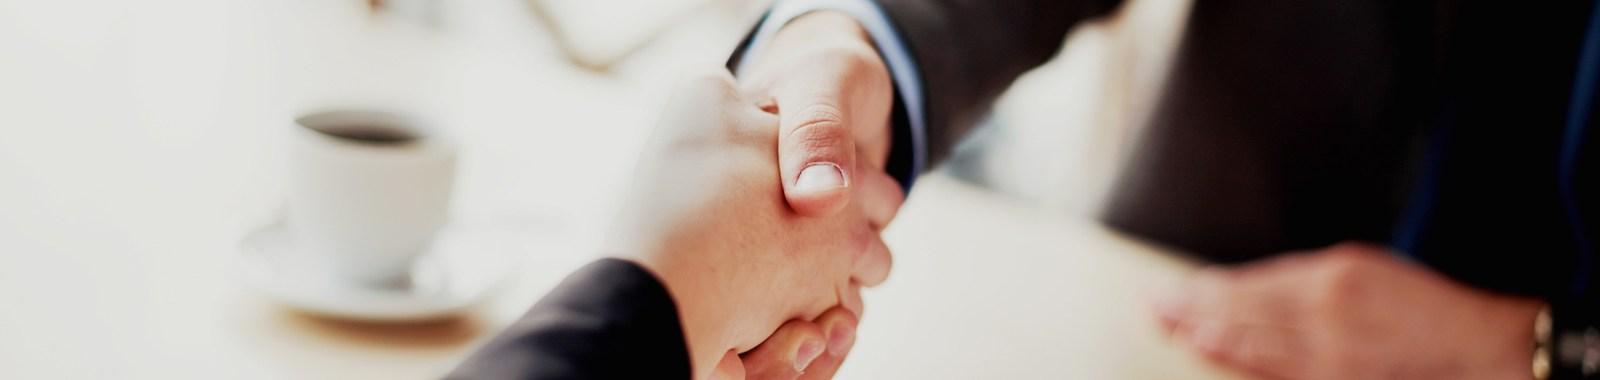 Handshake closeup of businesswoman and businessman.